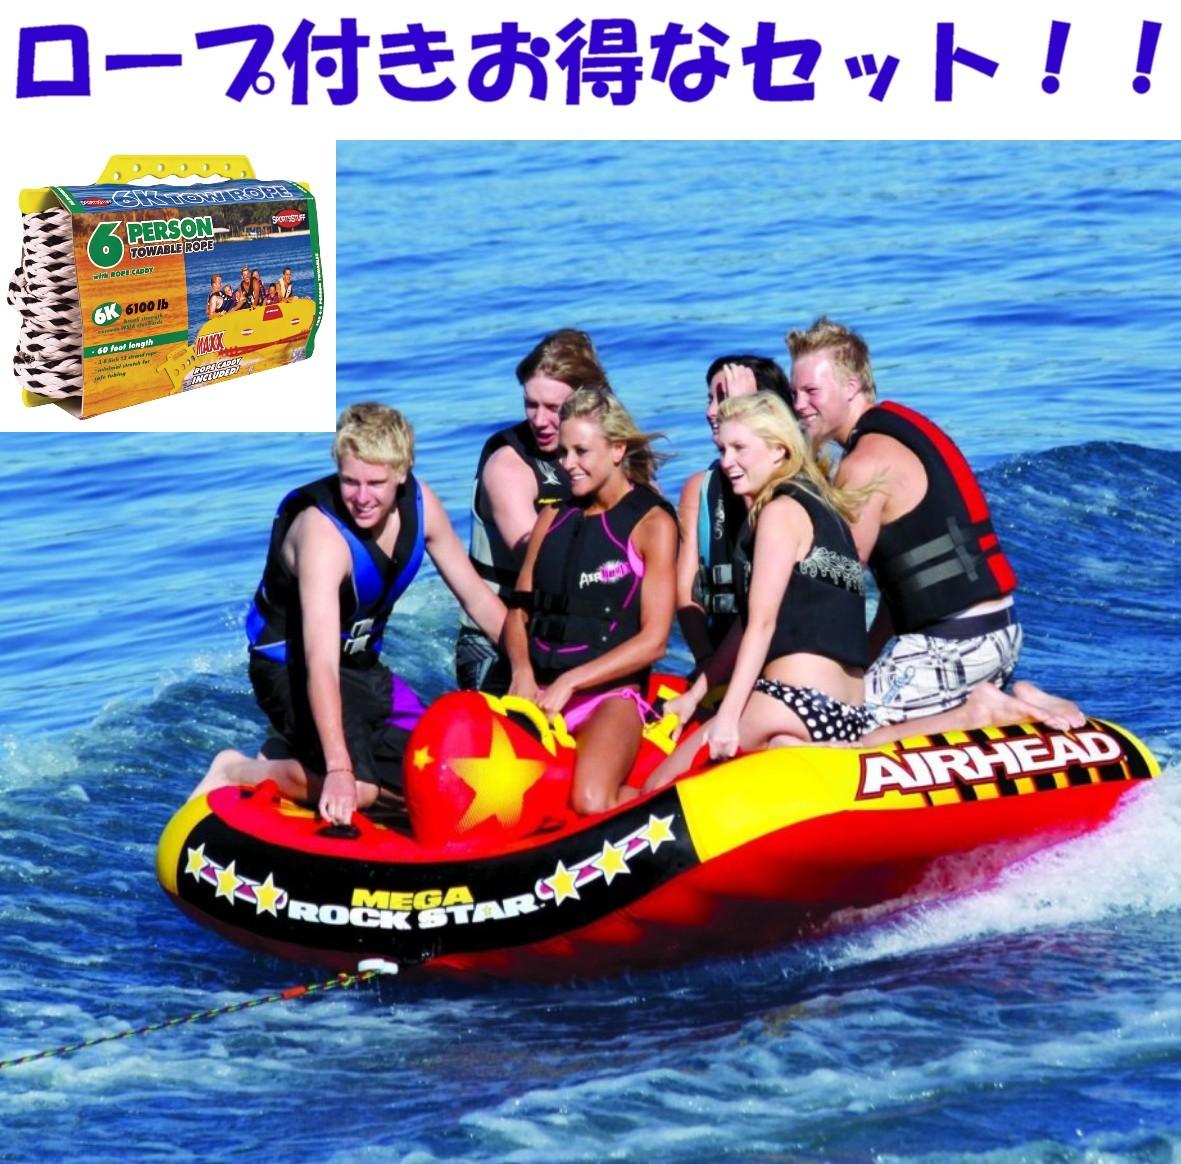 AIRHEAD MEGA ROCK STAR メガ ロック スター ウォータートーイ ウォータートーイ 6人用 ロープ付きセット, 川口工器株式会社 Online Shop:29bf0605 --- chargers.jp